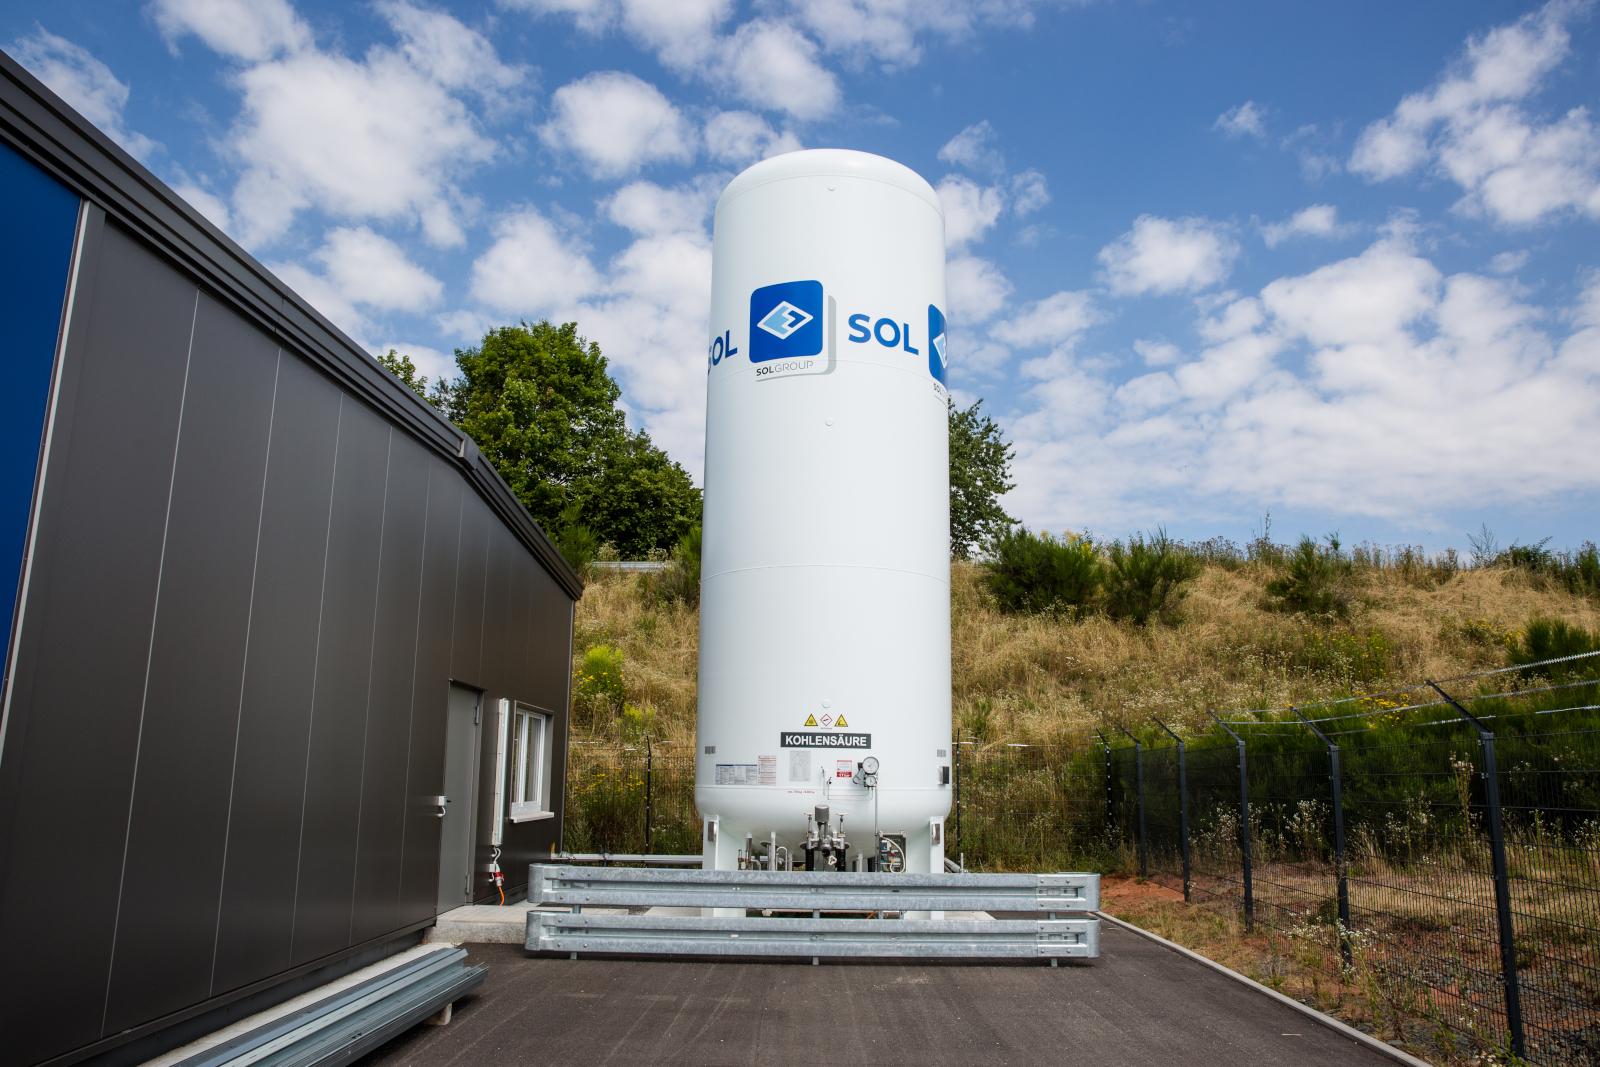 kks-kohlensäure-und-trockeneis-co2-tank